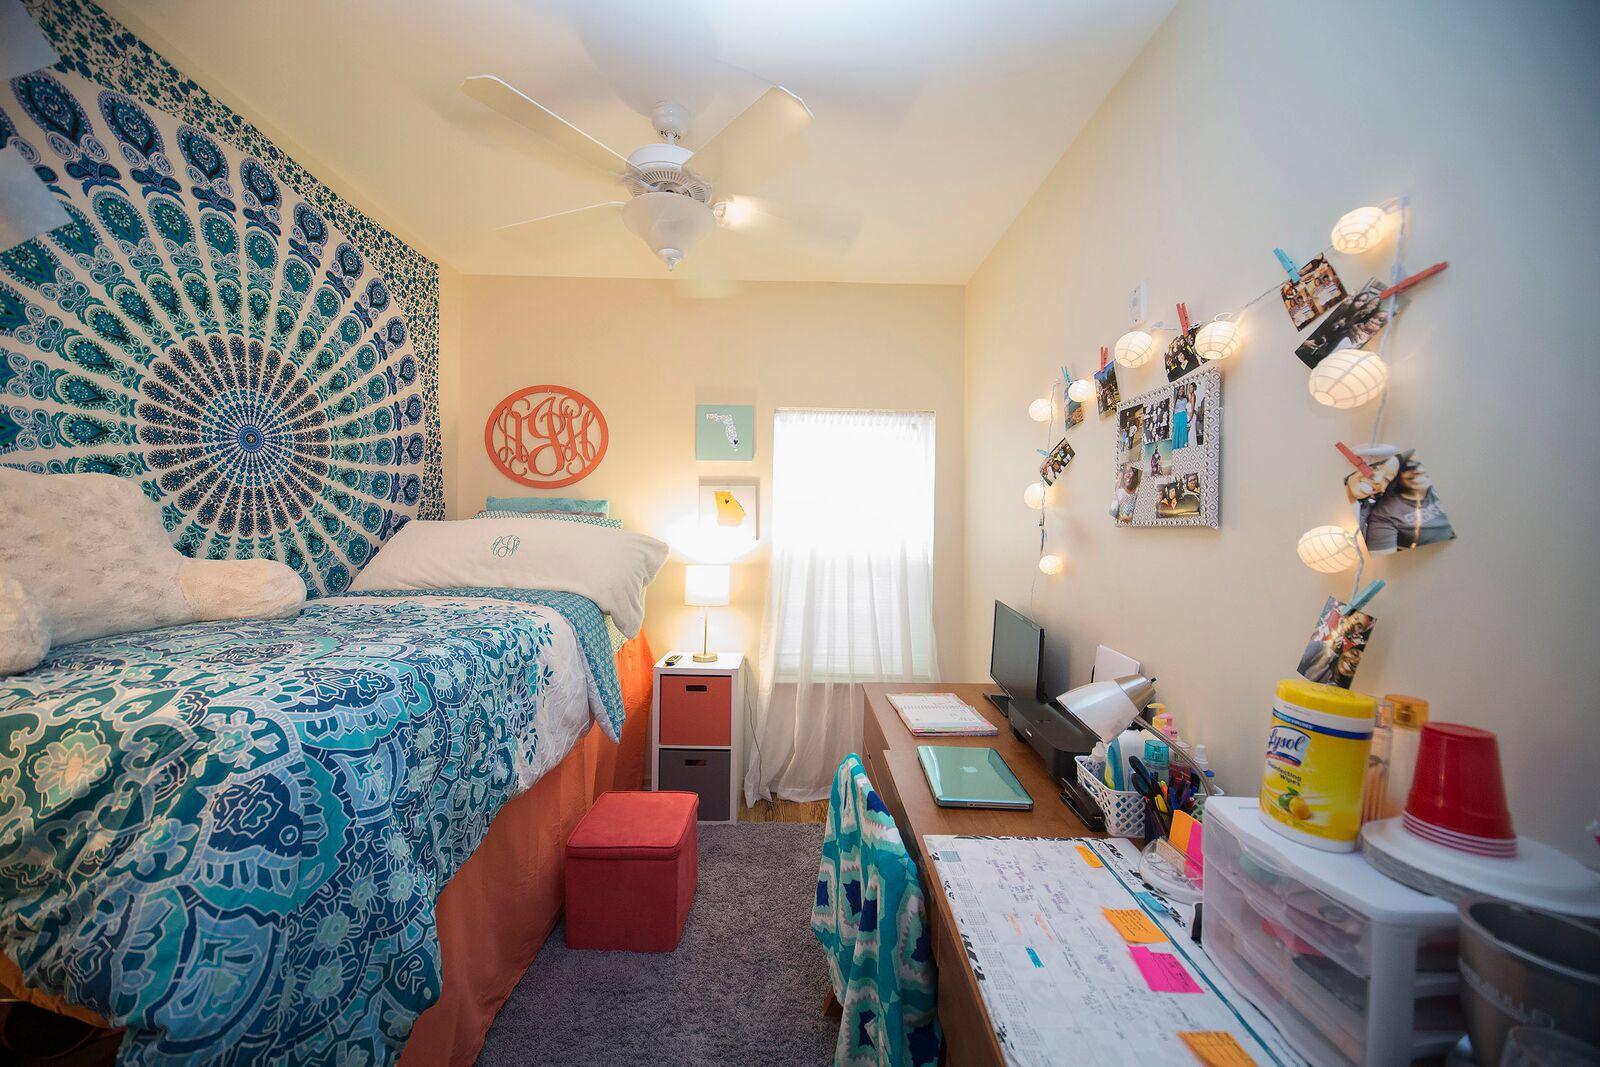 My dorm room at Valdosta state university -tapestry Amazon -sheets ...